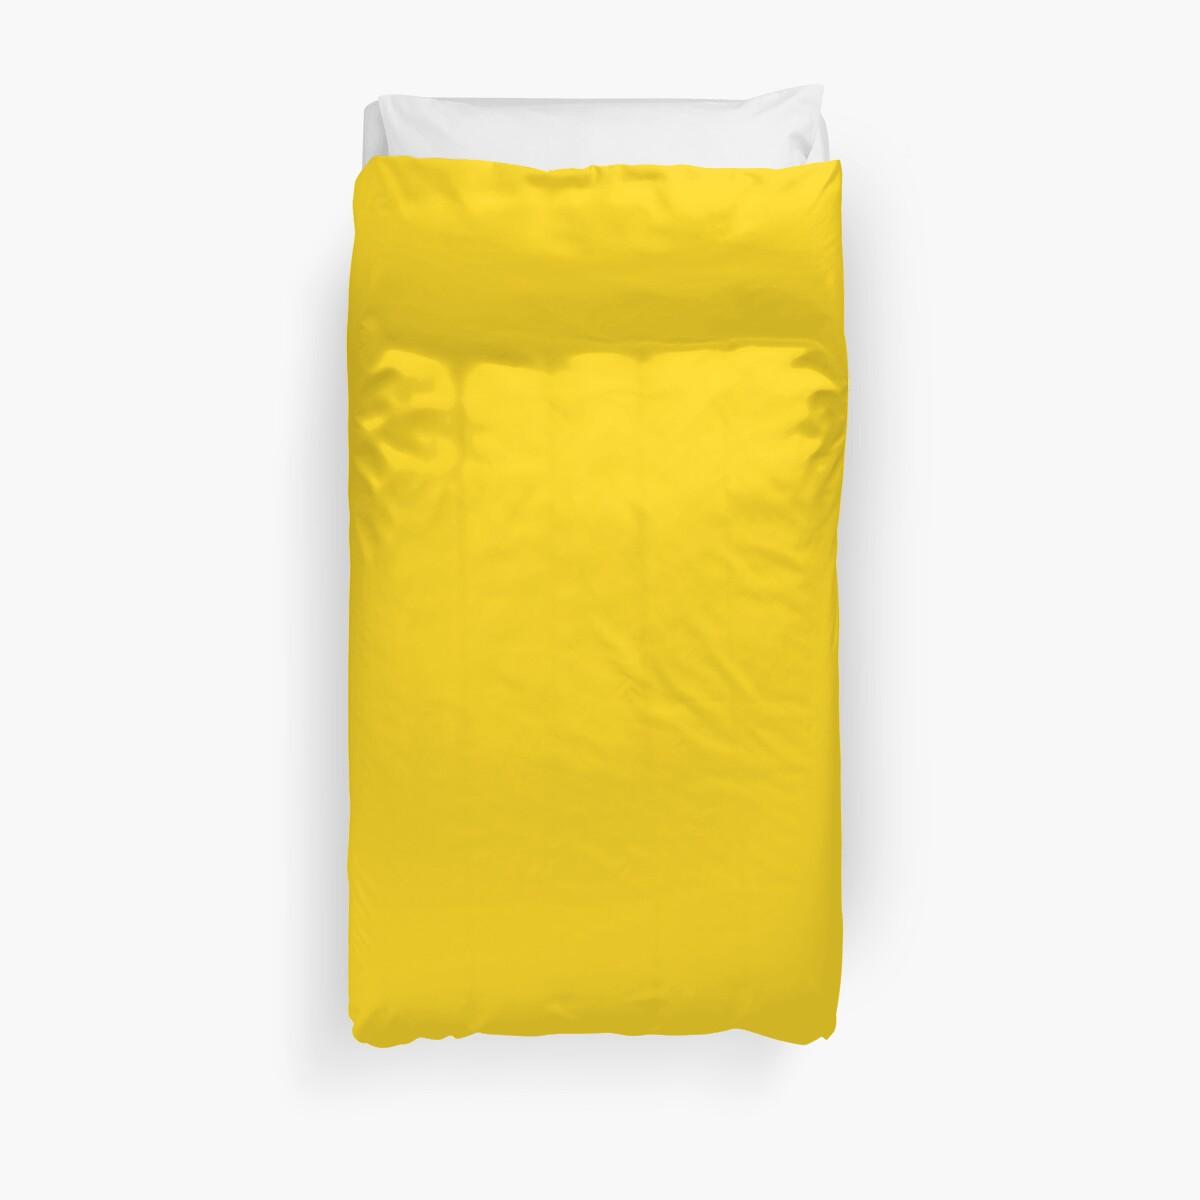 Natural Color Yellow  by Detnecs2013